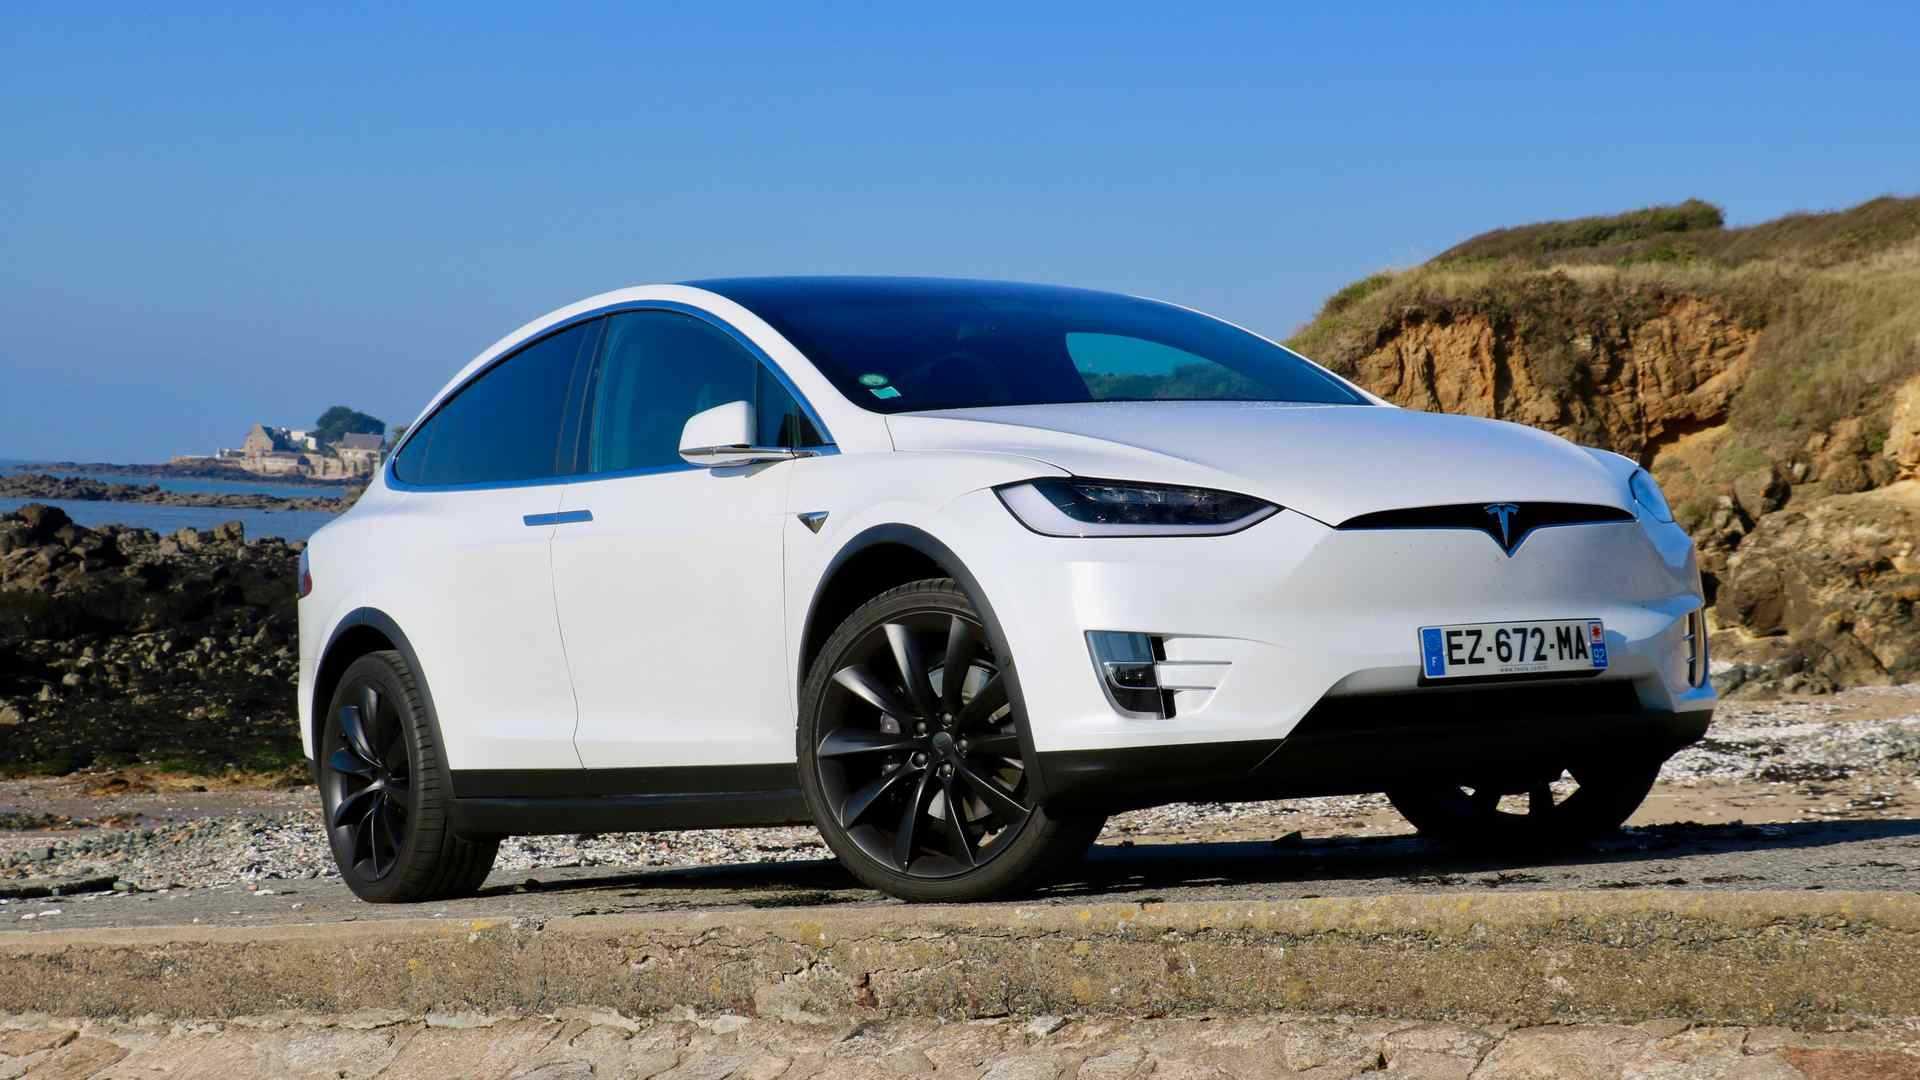 Extraordinary Tesla Model X Family Road Trip: Part 2